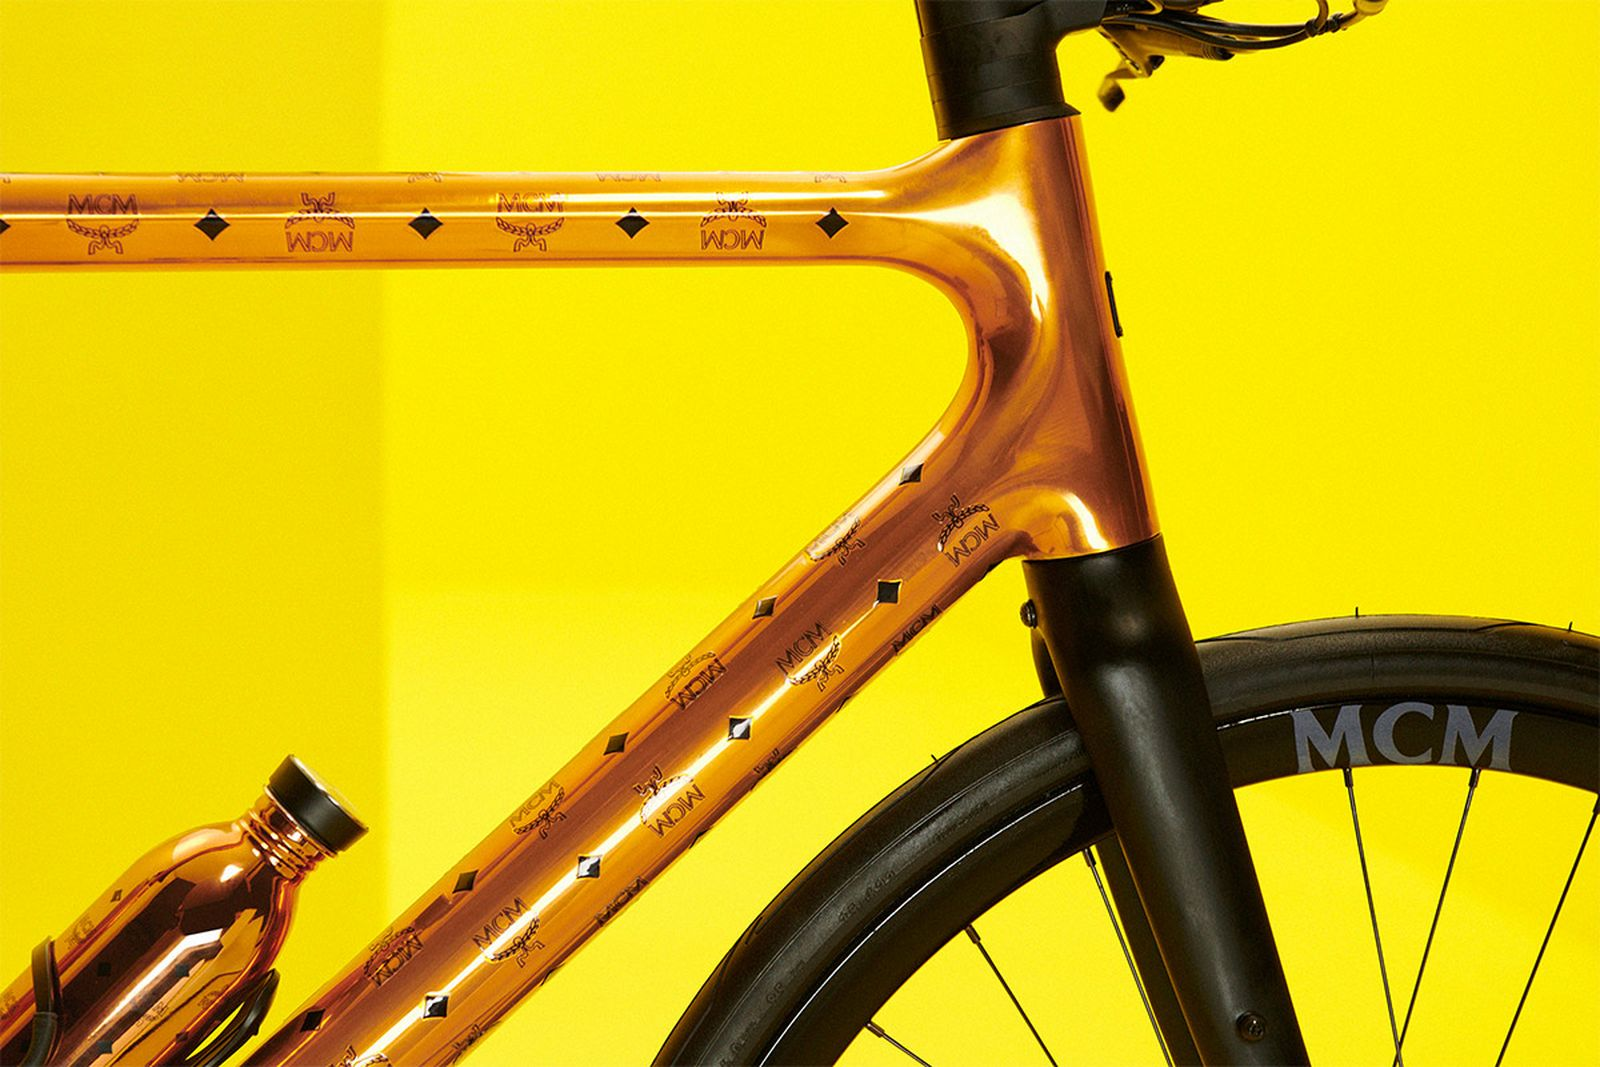 mcm-urwahn-e-bike-03